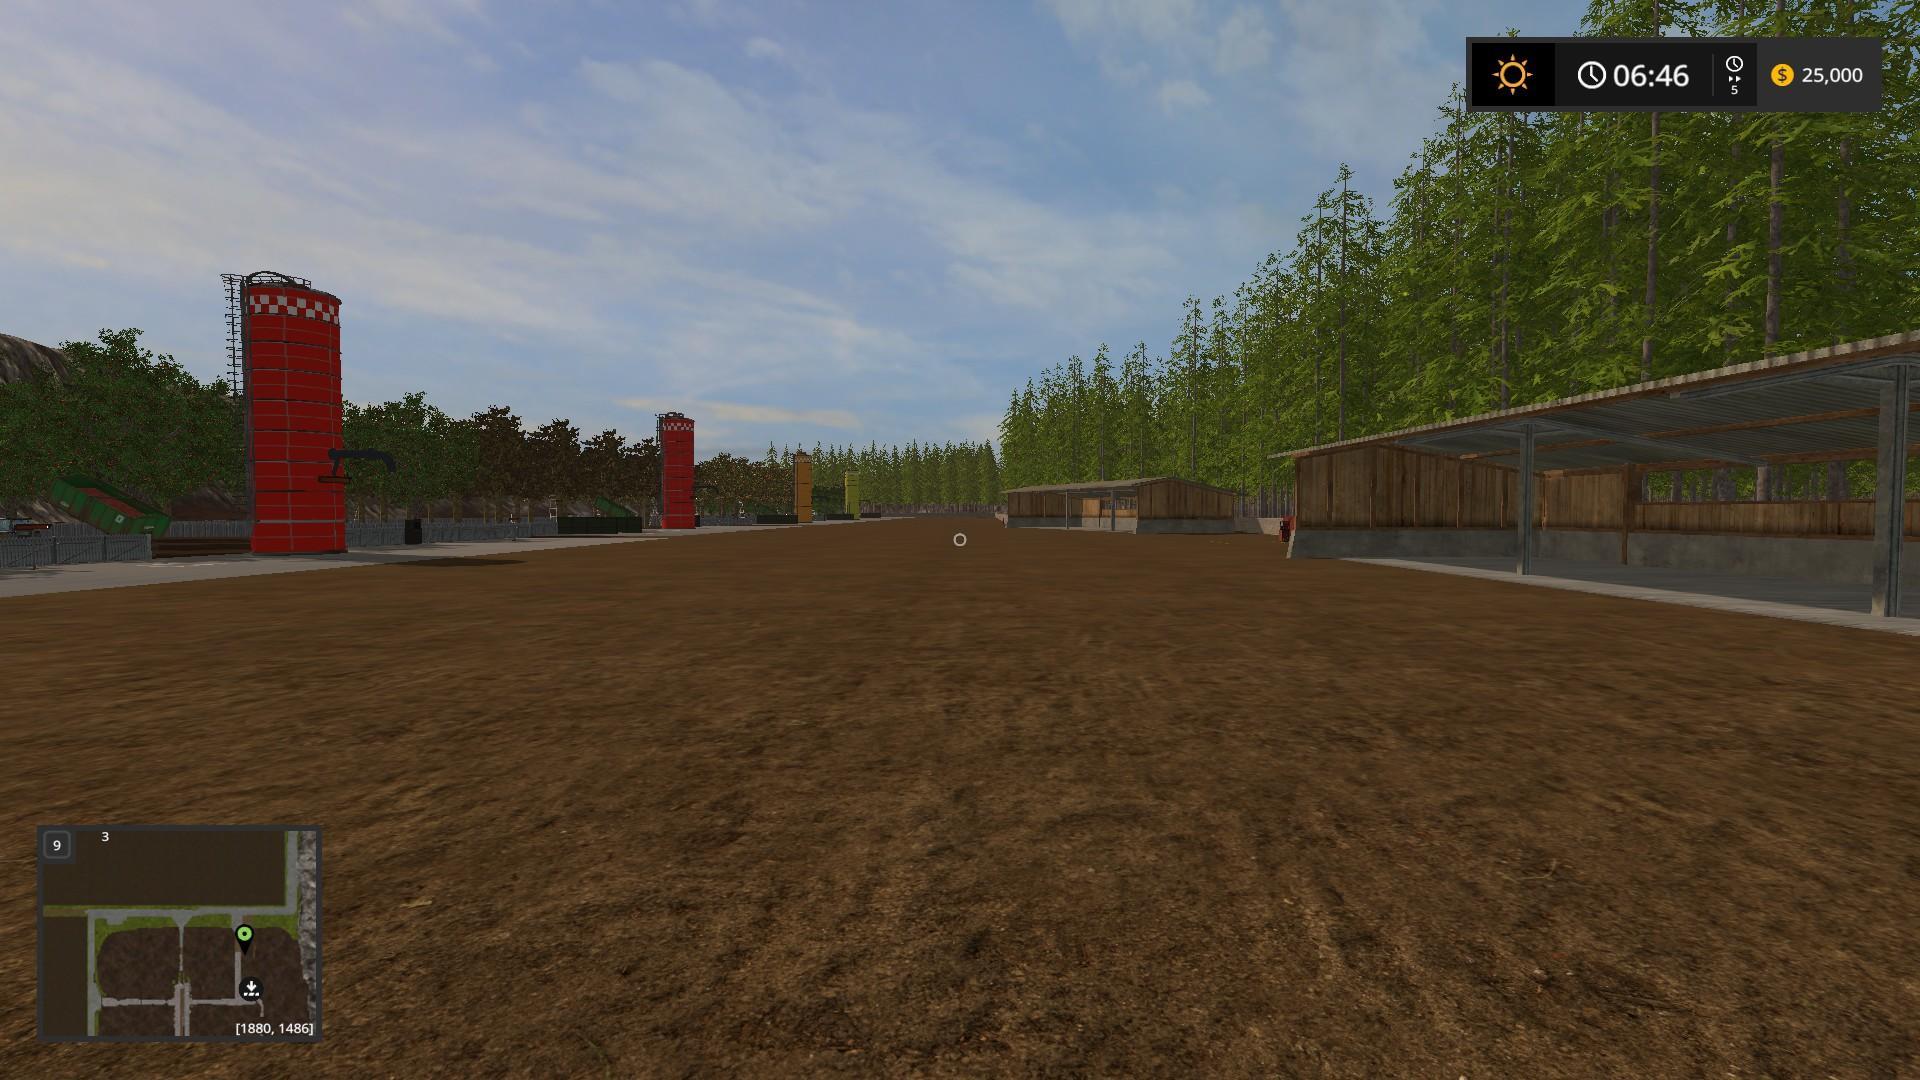 HOBBS FARM V45 MAP Farming simulator 17 2017 mod